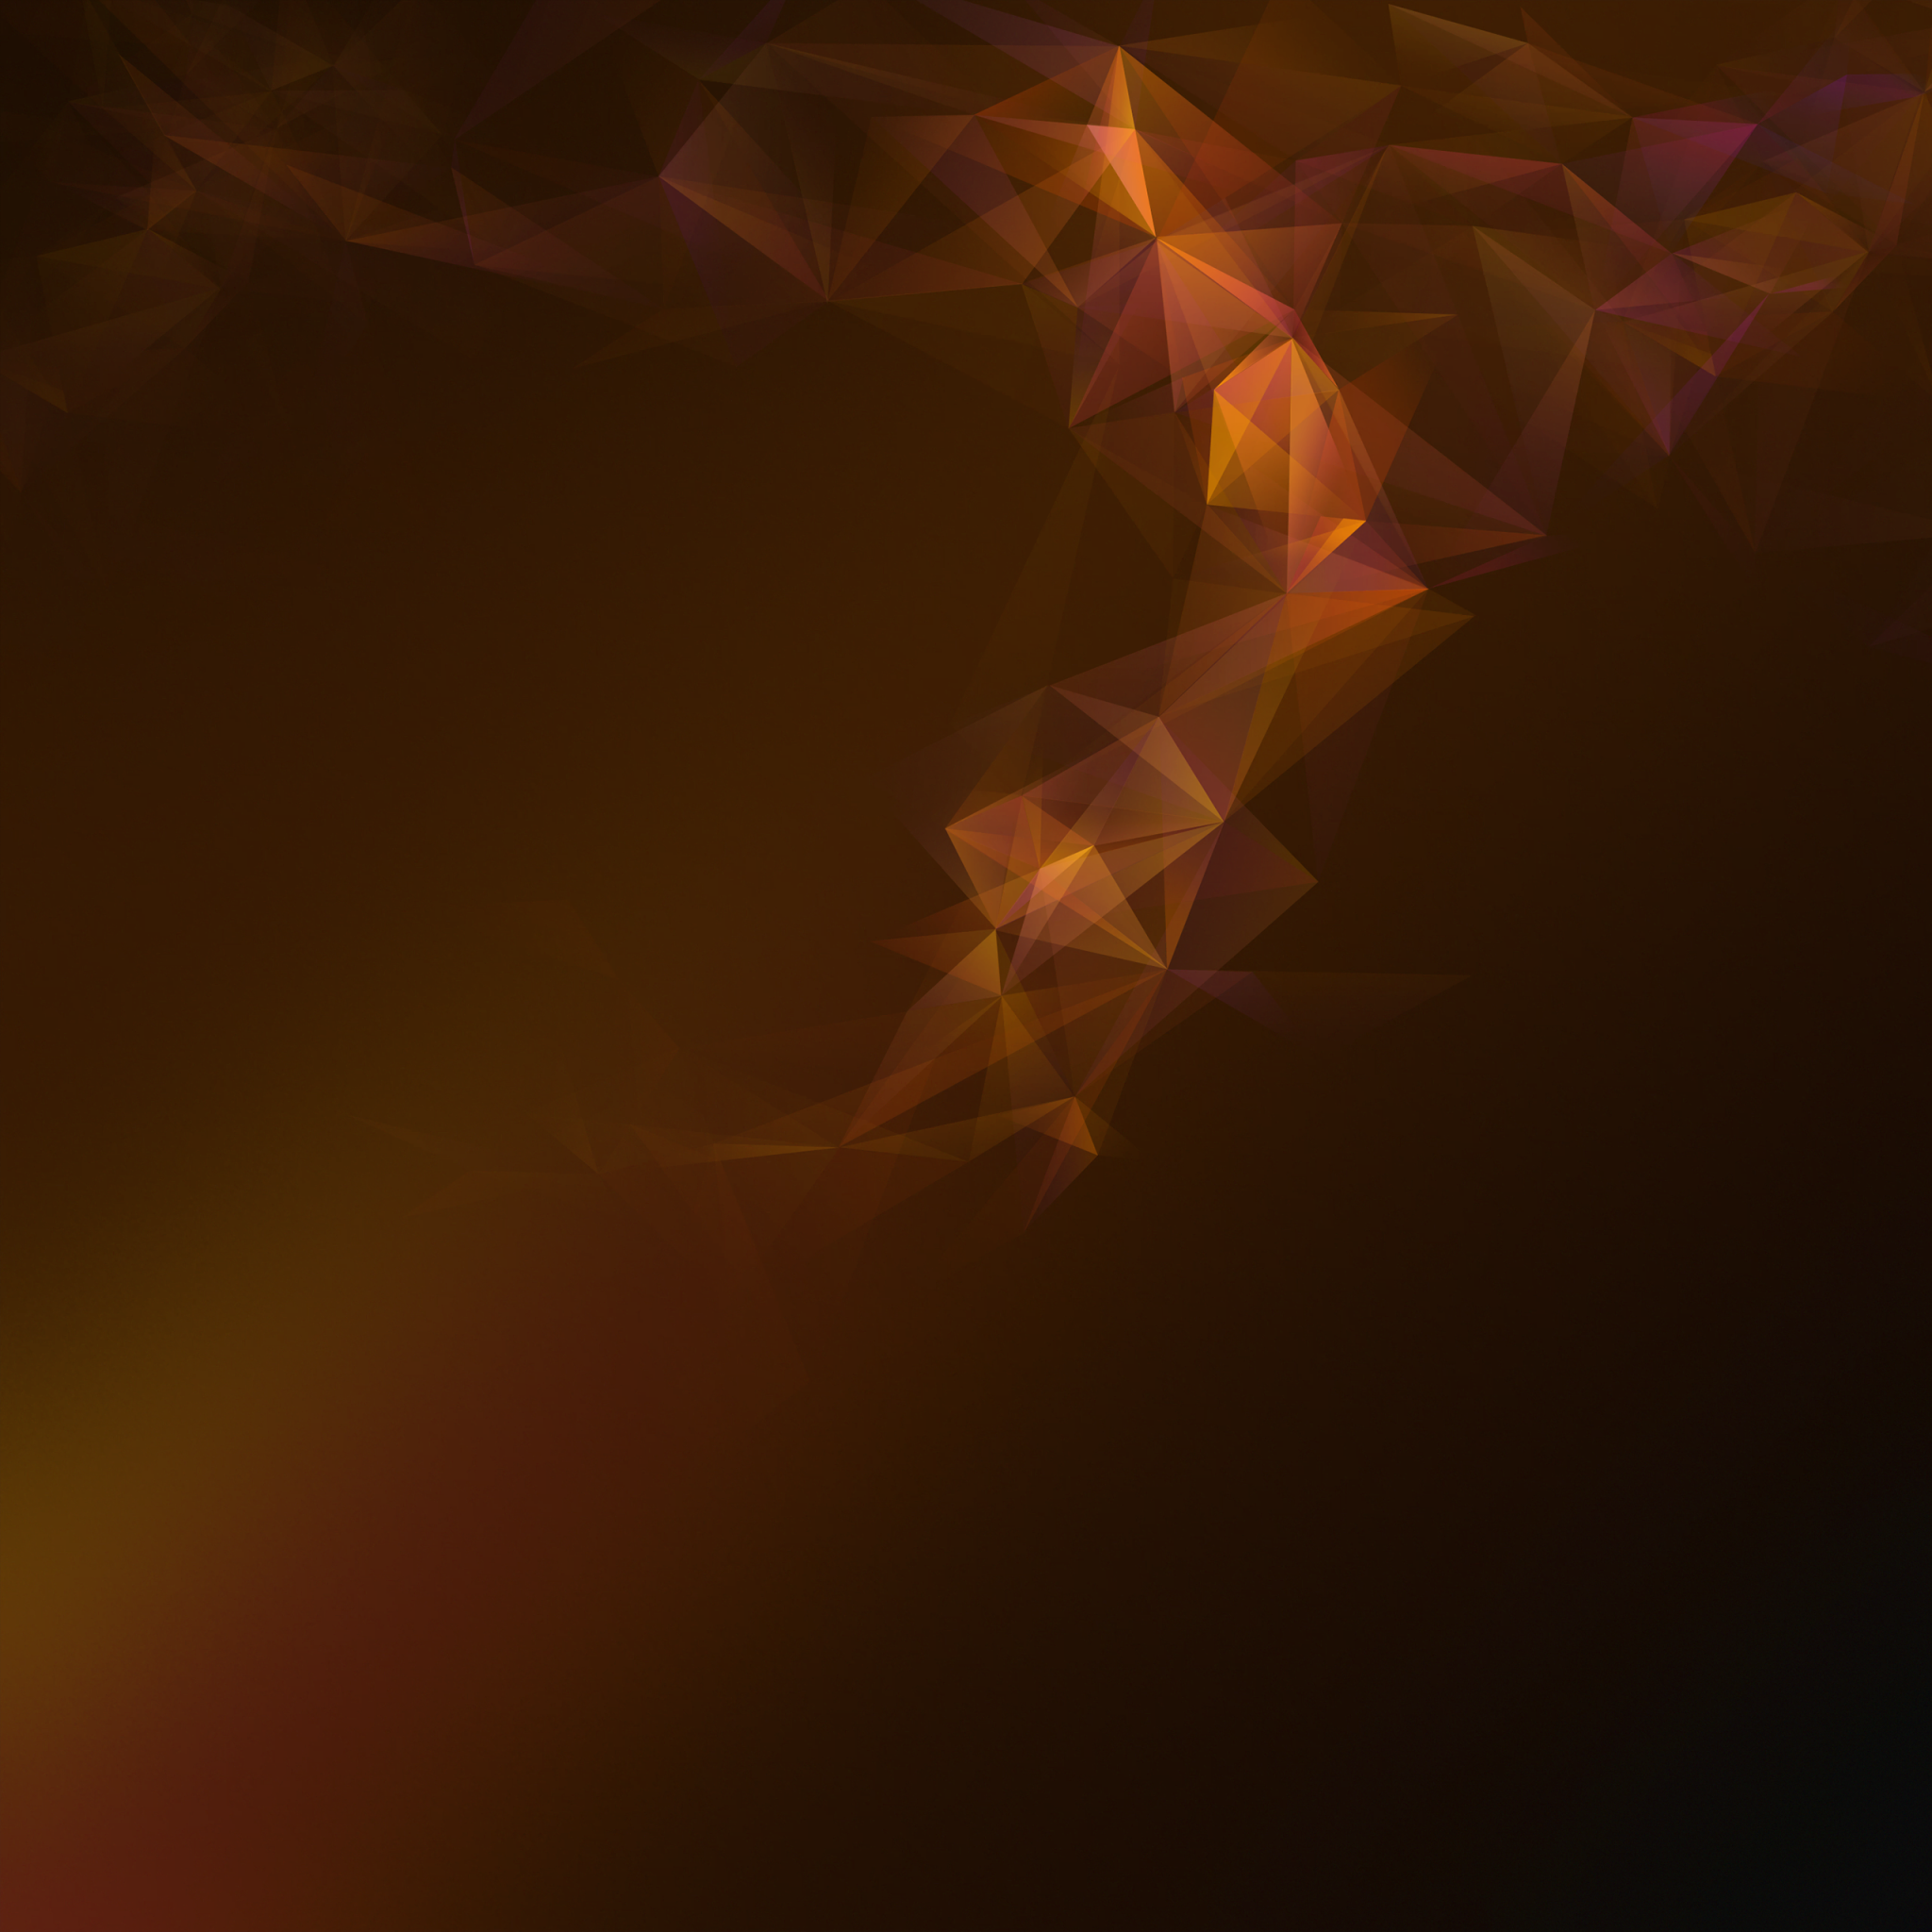 Must see Wallpaper Home Screen Xperia - Galaxy-s9-wallpaper-1-techfoogle  HD_449824.png?w\u003d300